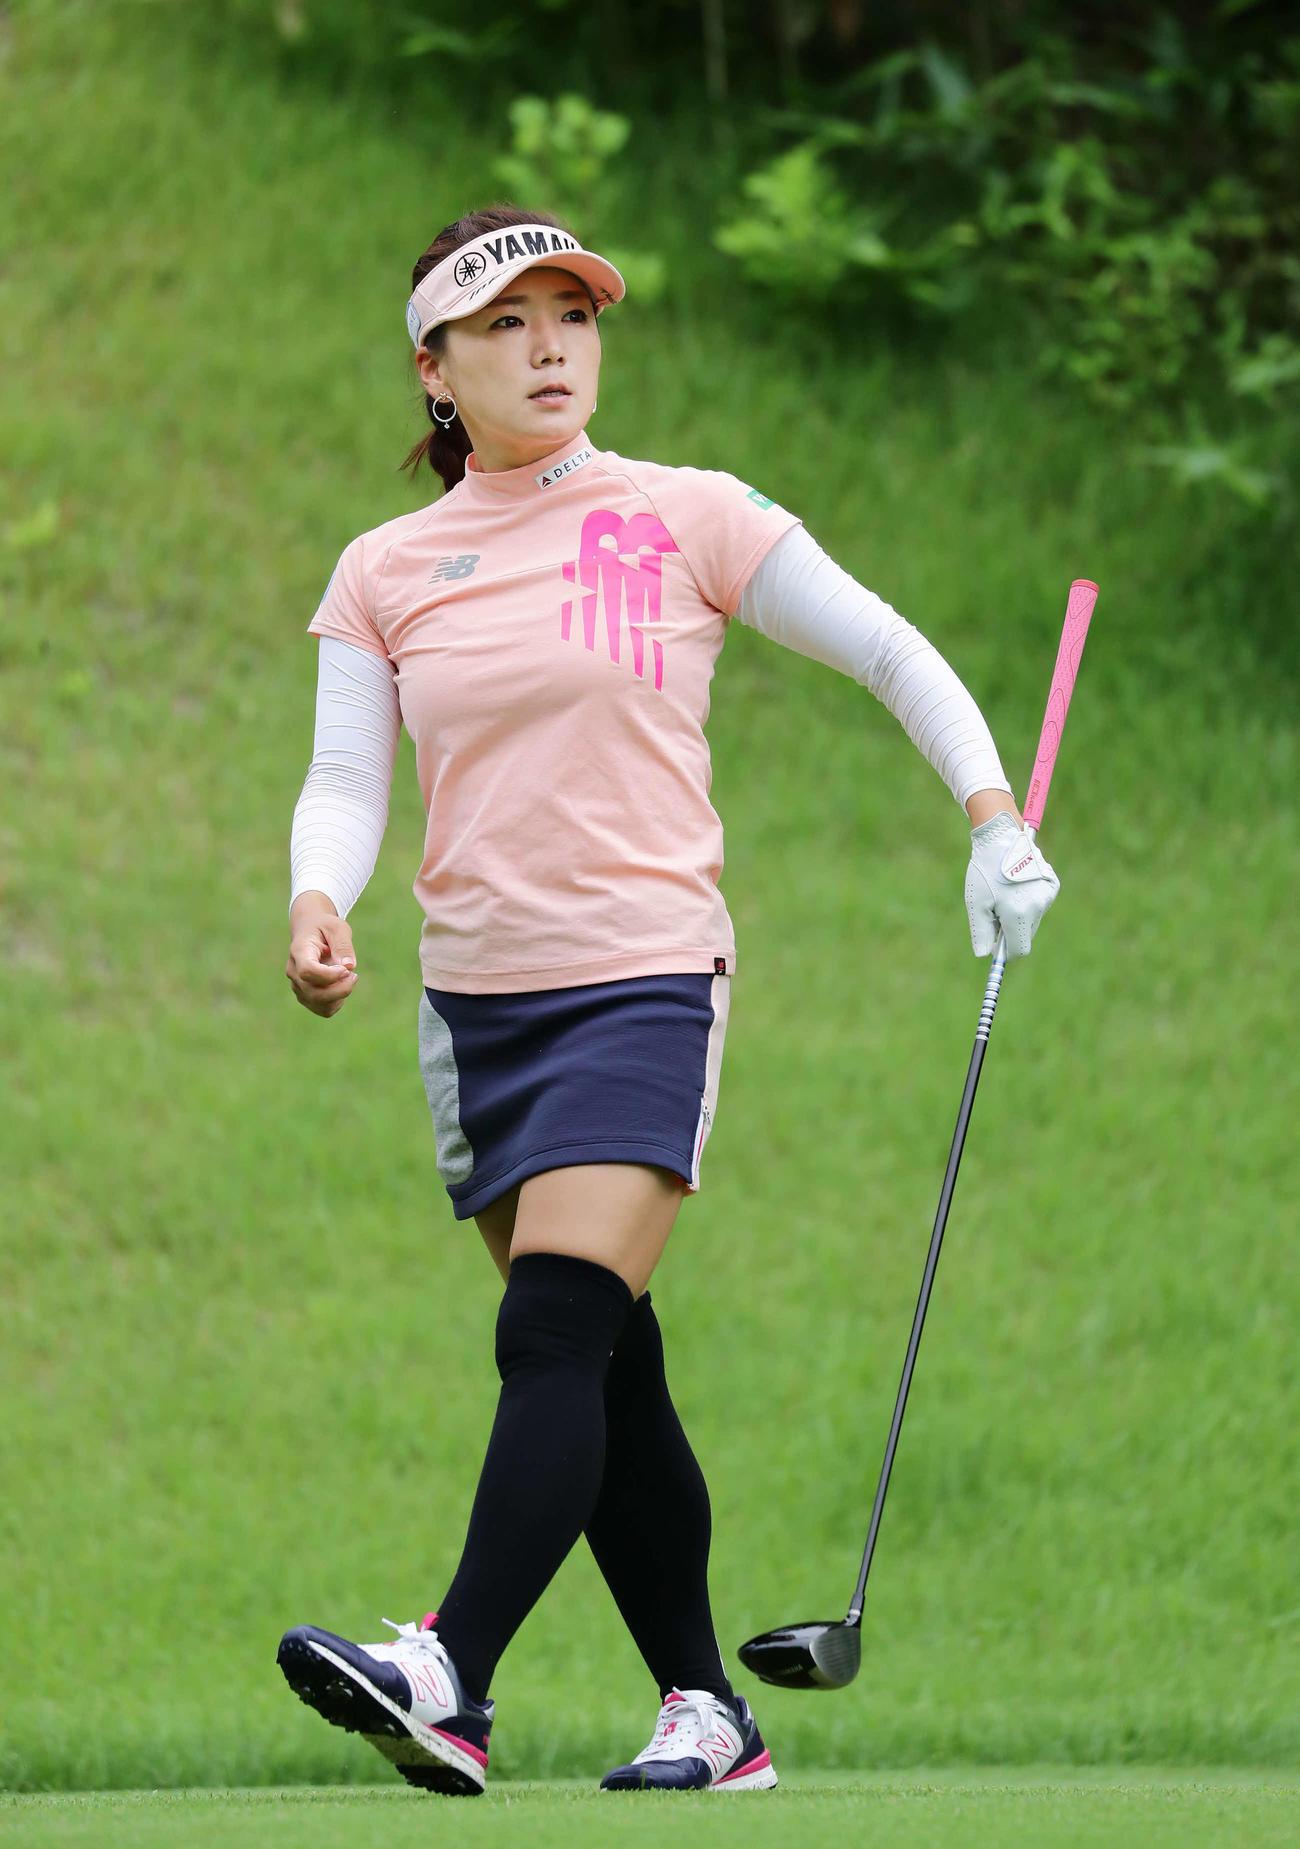 https://www.nikkansports.com/sports/golf/news/img/202106060000024-w1300_9.jpg